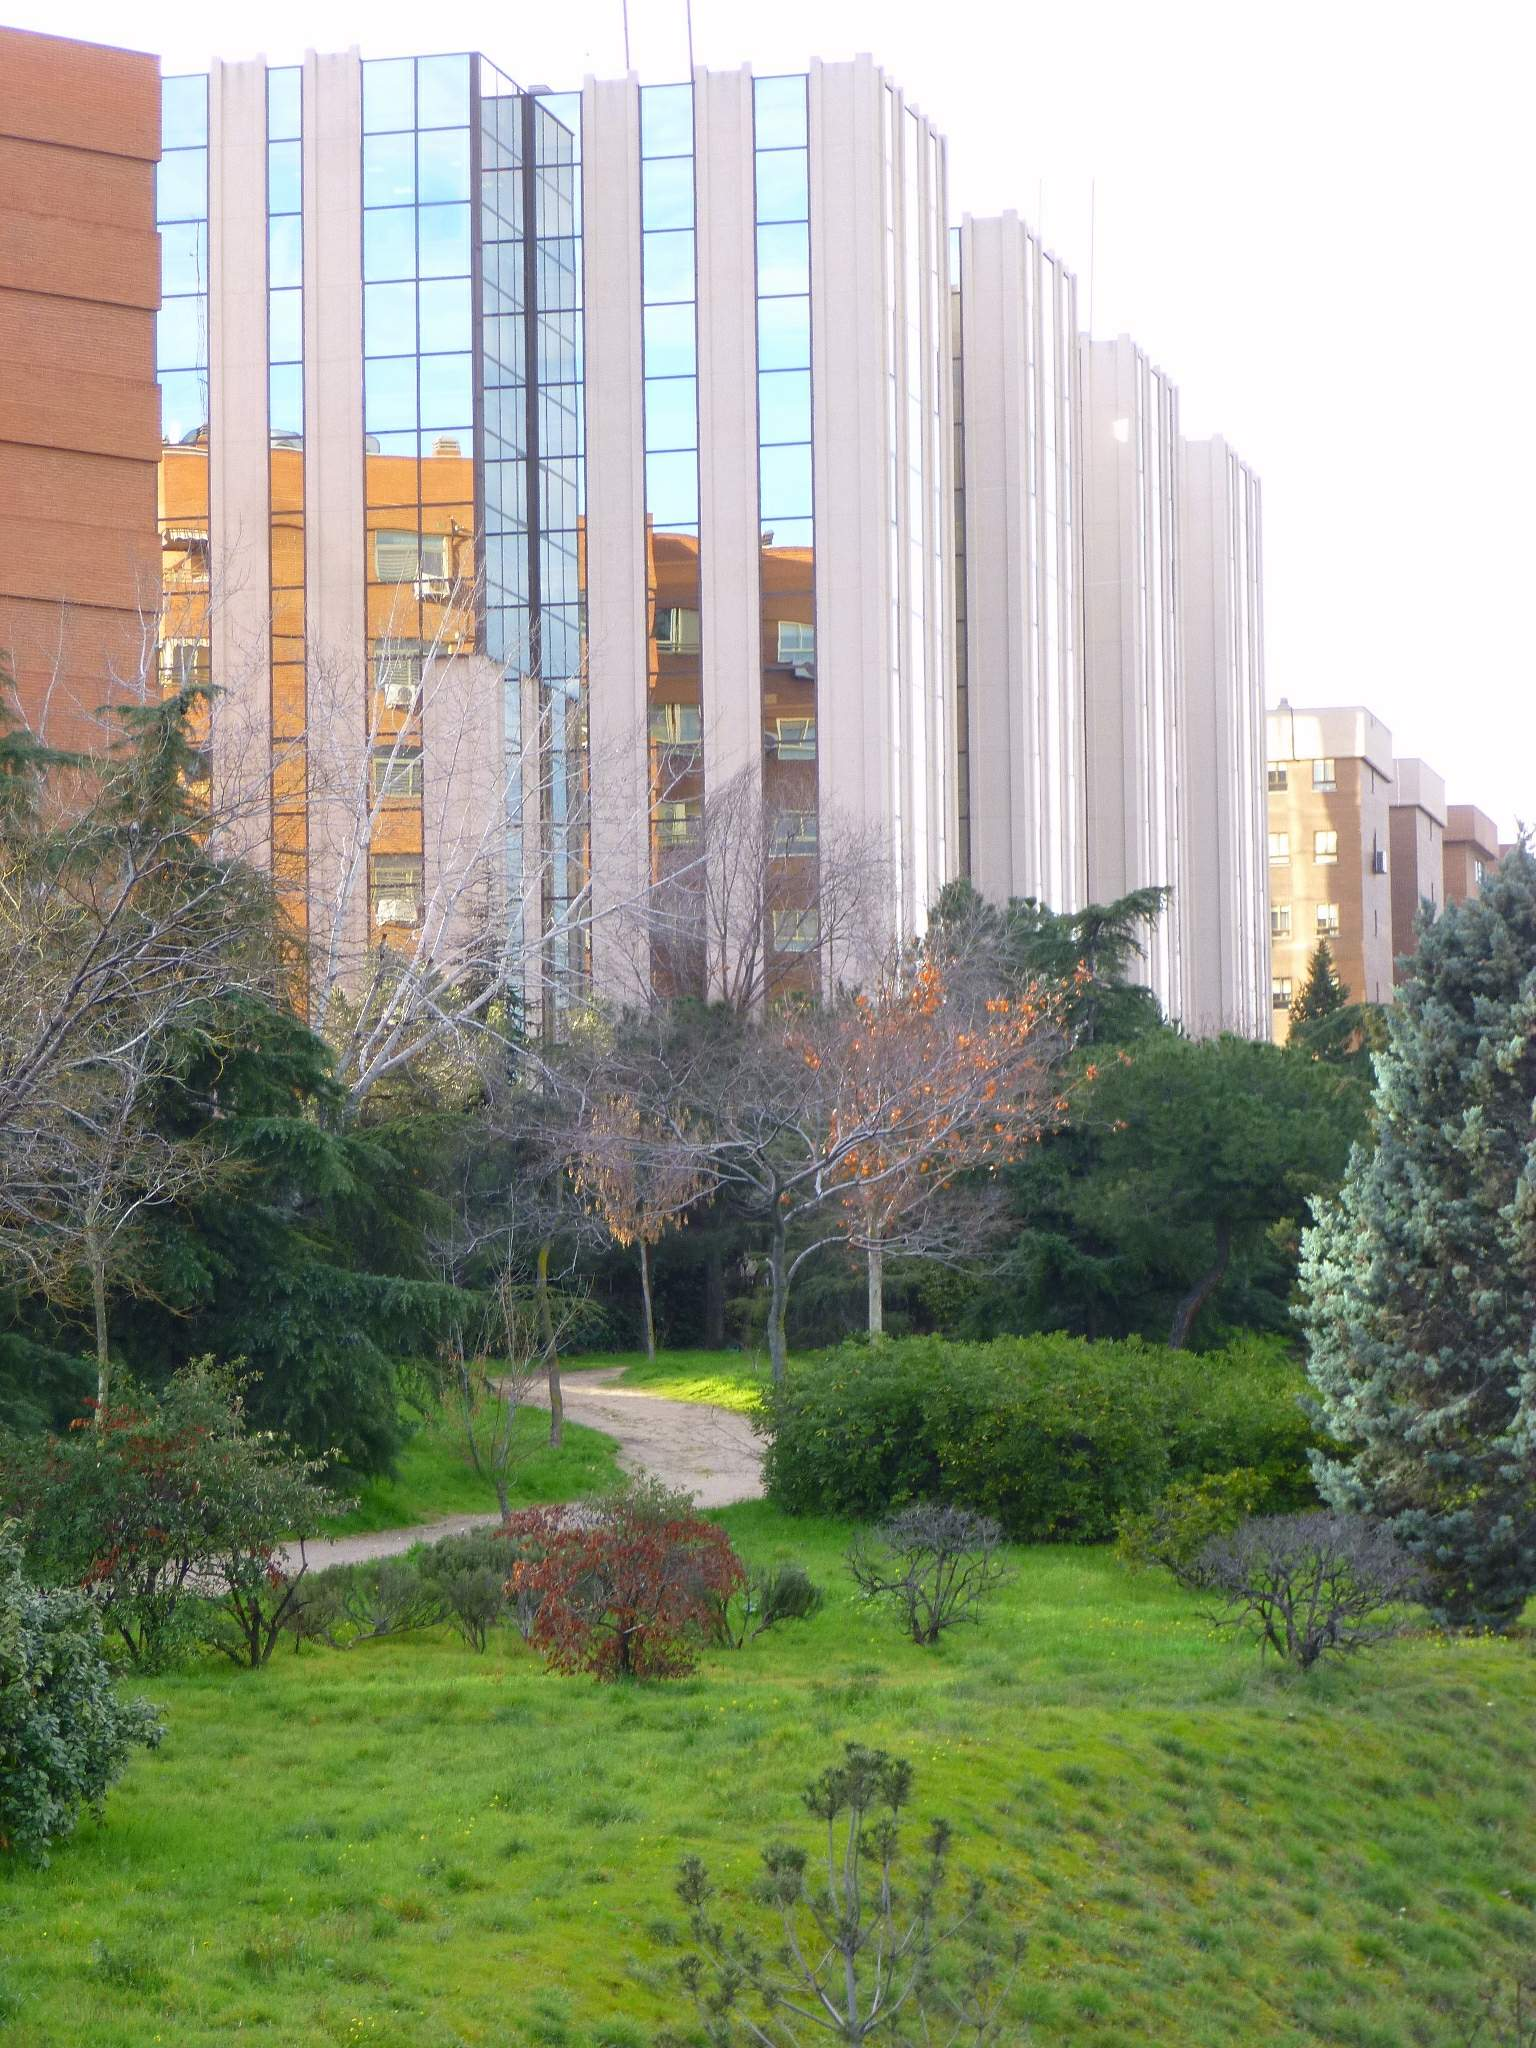 File:Madrid - Barrio de Pinar de Chamartín 2.JPG - Wikimedia Commons